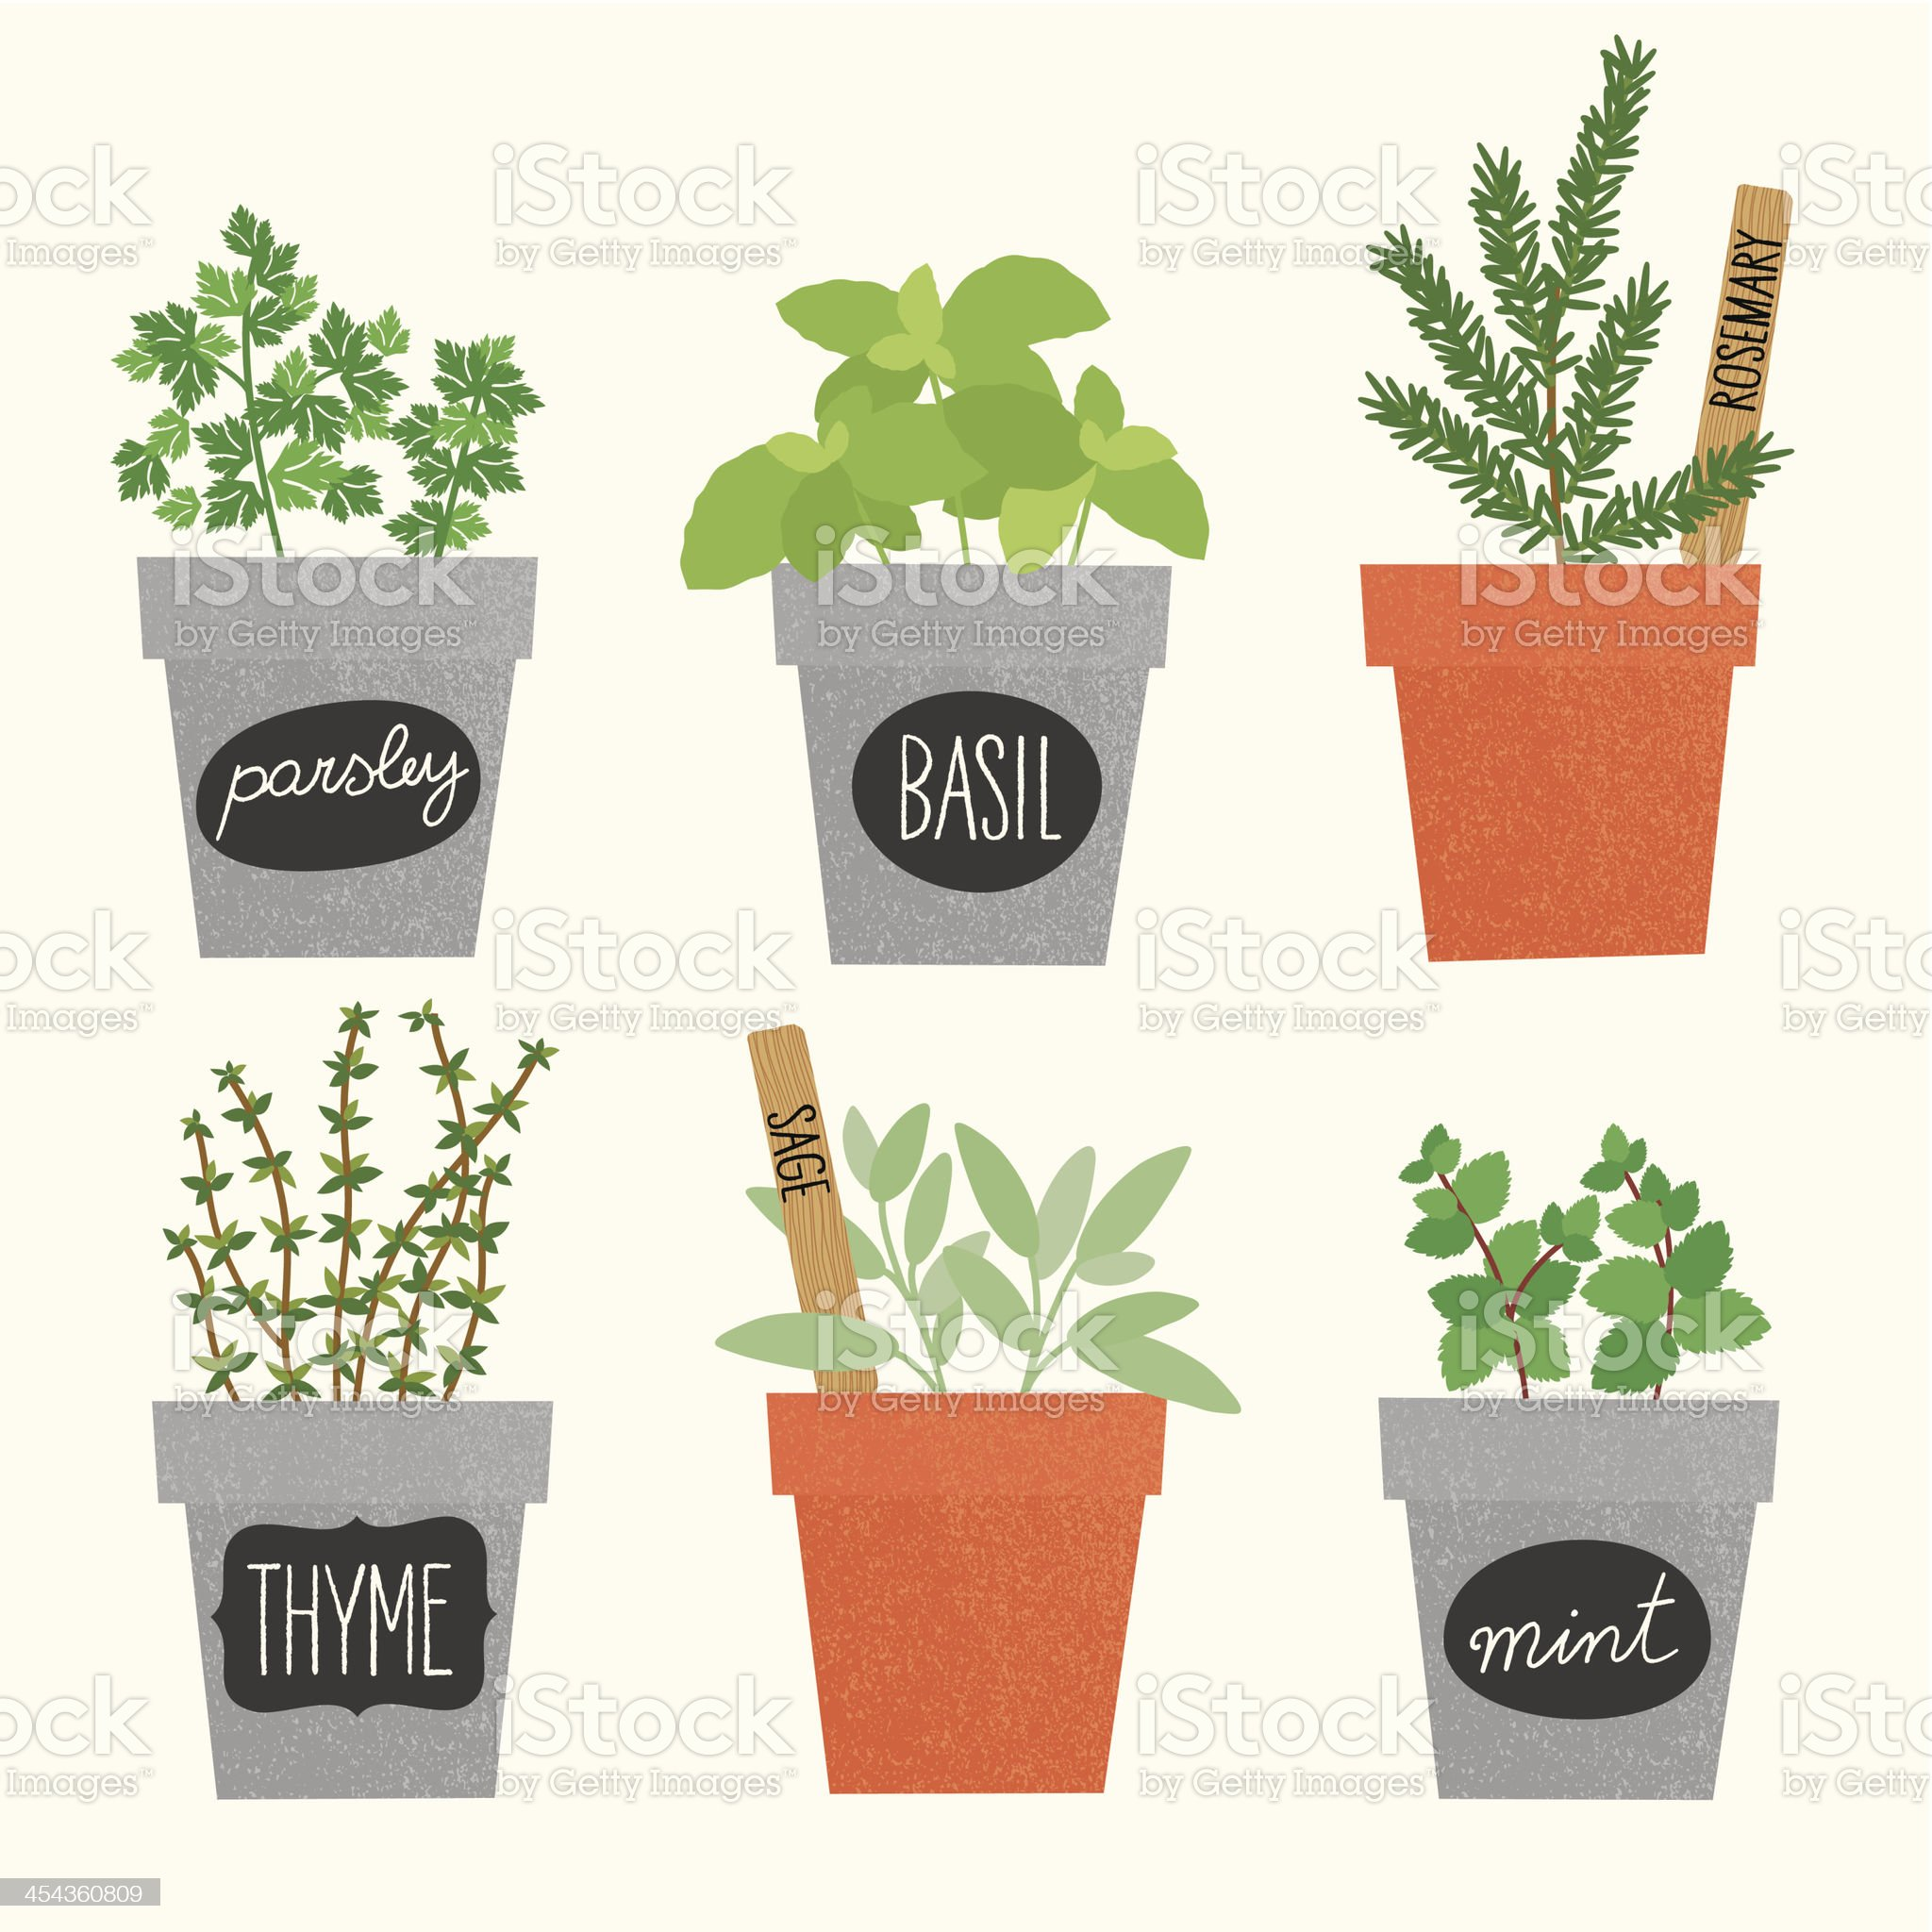 Herbs pots royalty-free stock vector art